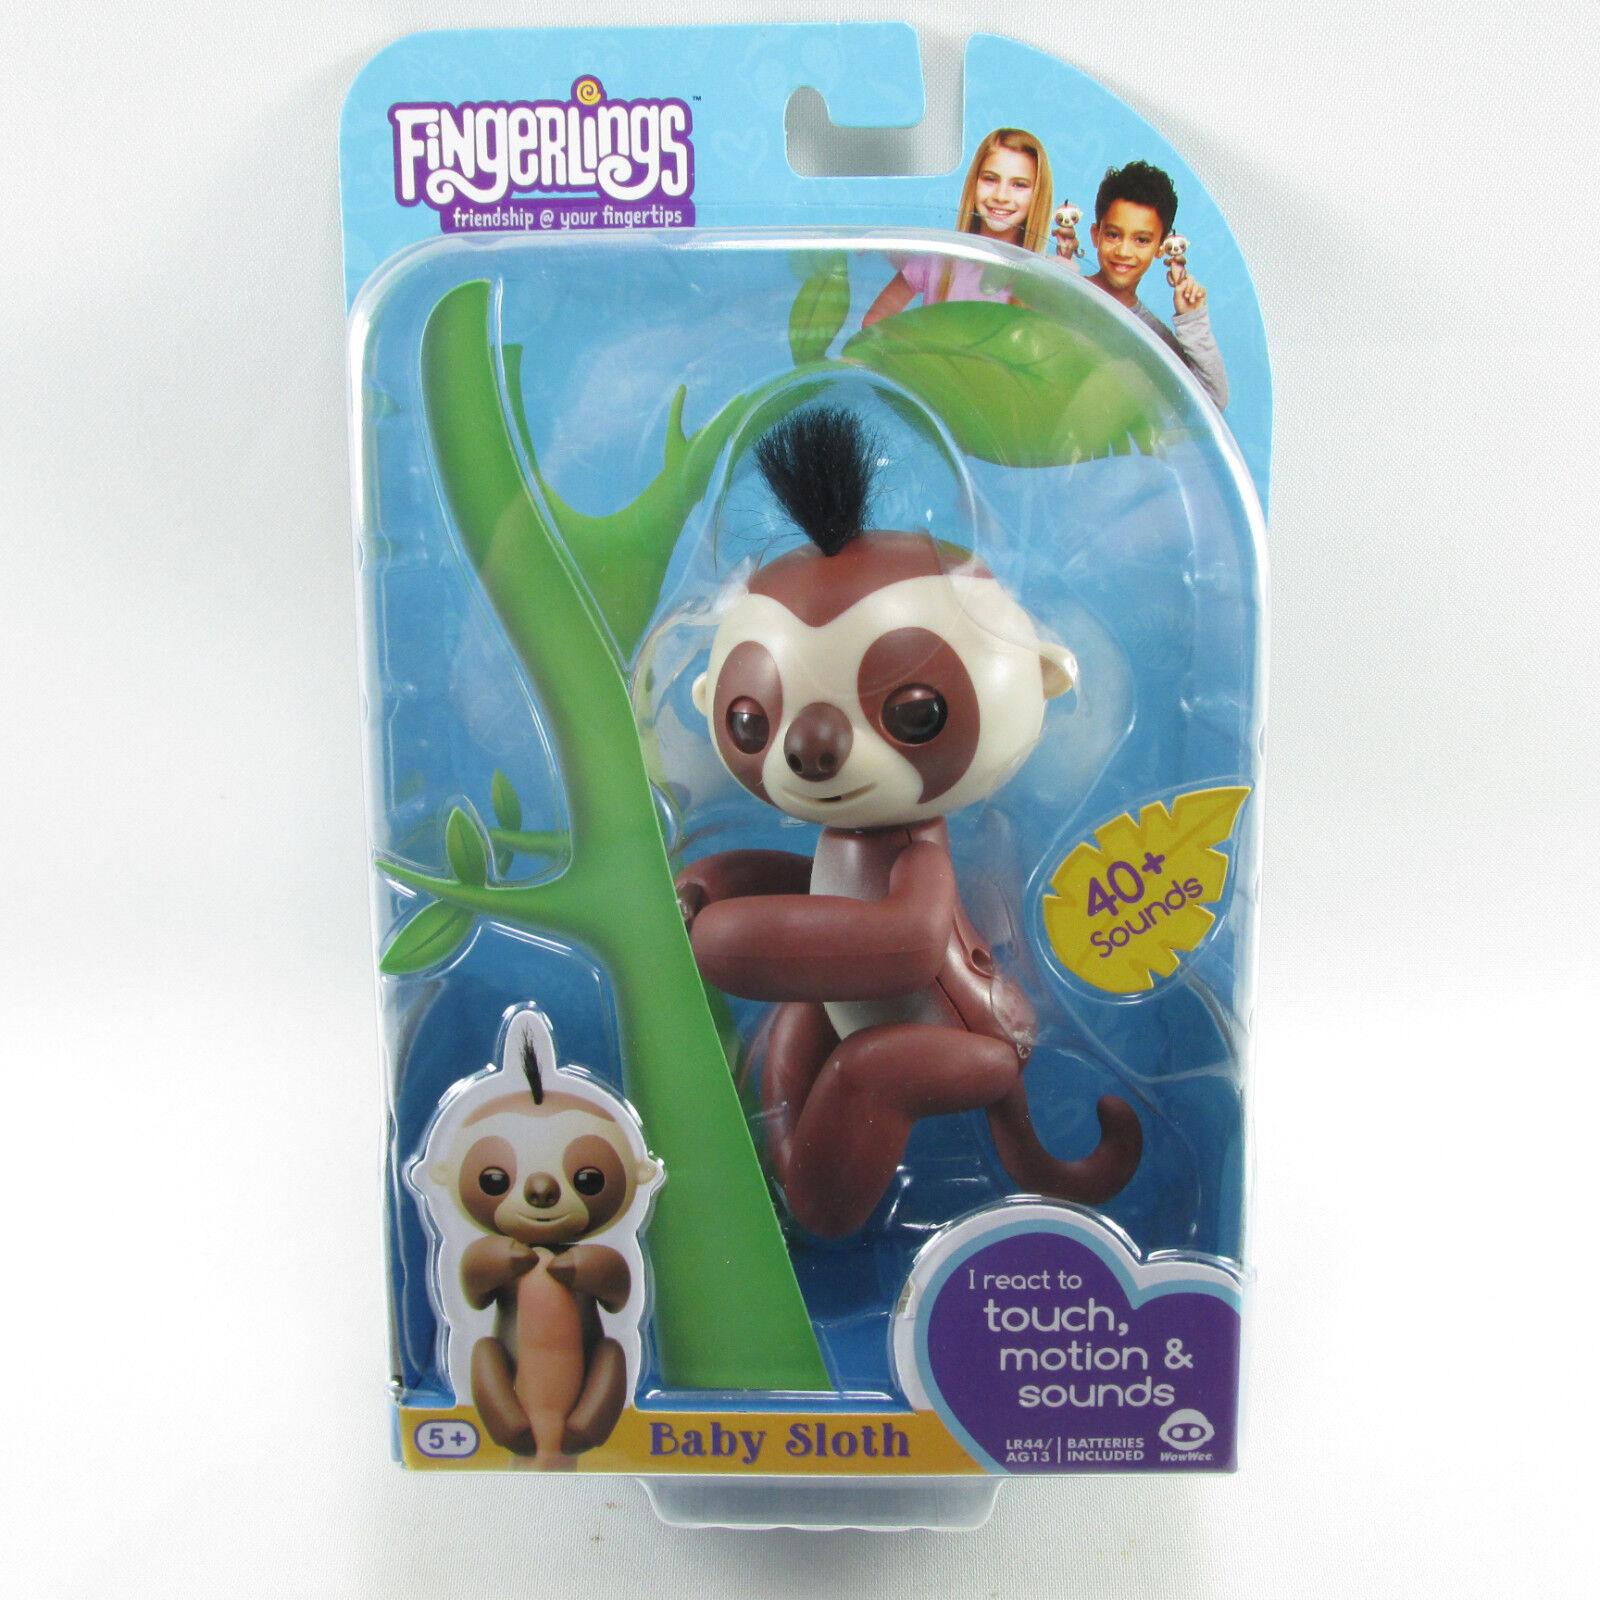 Fingerlings Baby Sloth Kingsley Interactive WowWee New Sealed